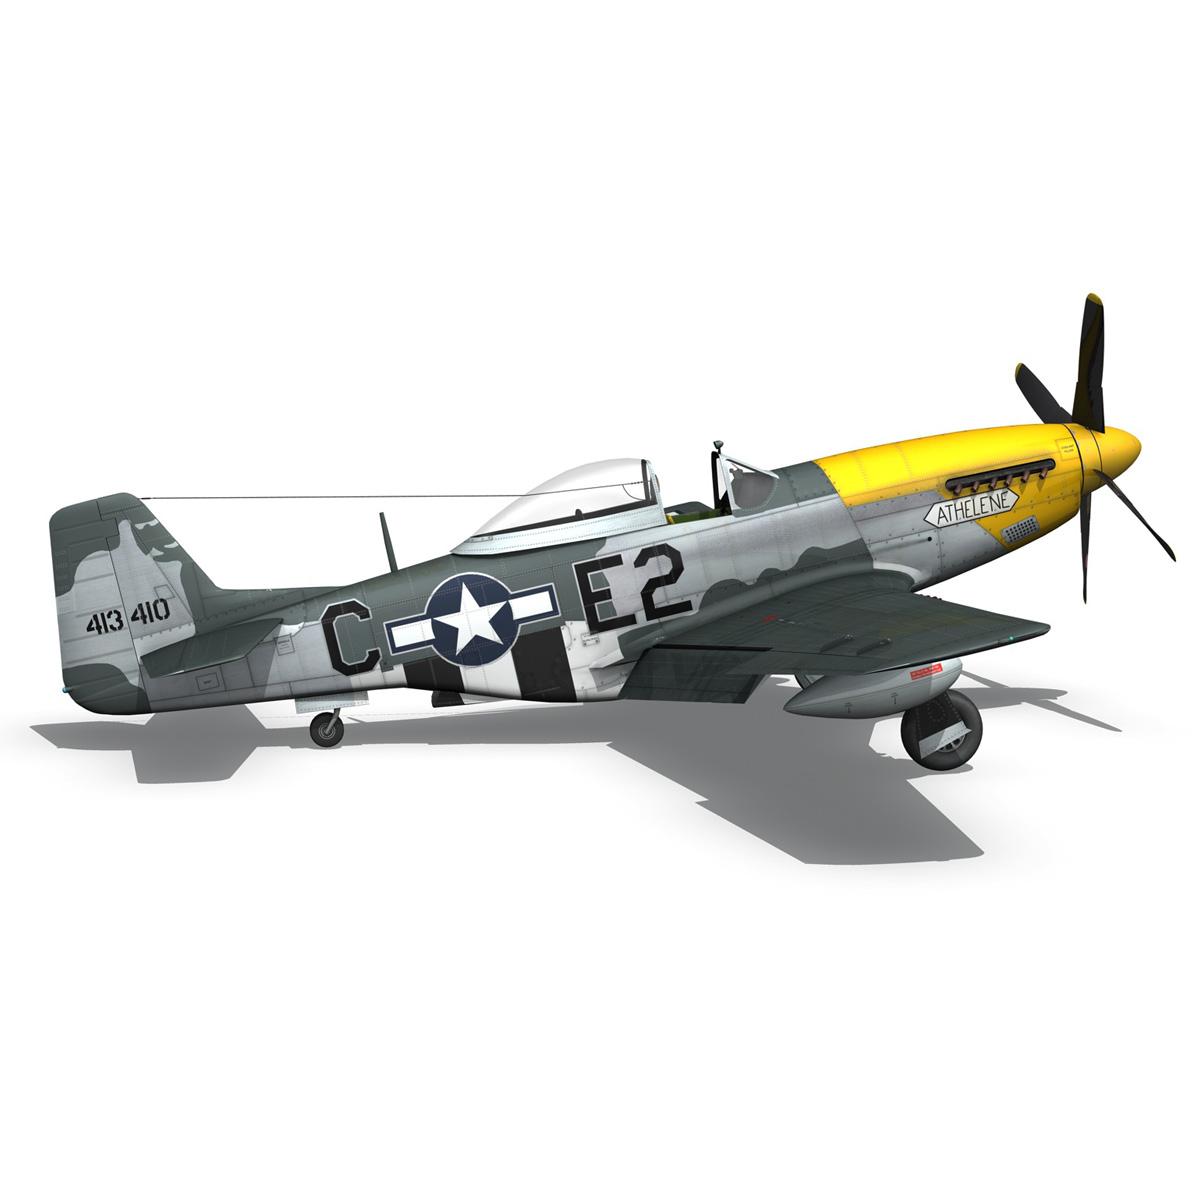 north american p-51d mustang – lou iv 3d model fbx c4d lwo obj 272611